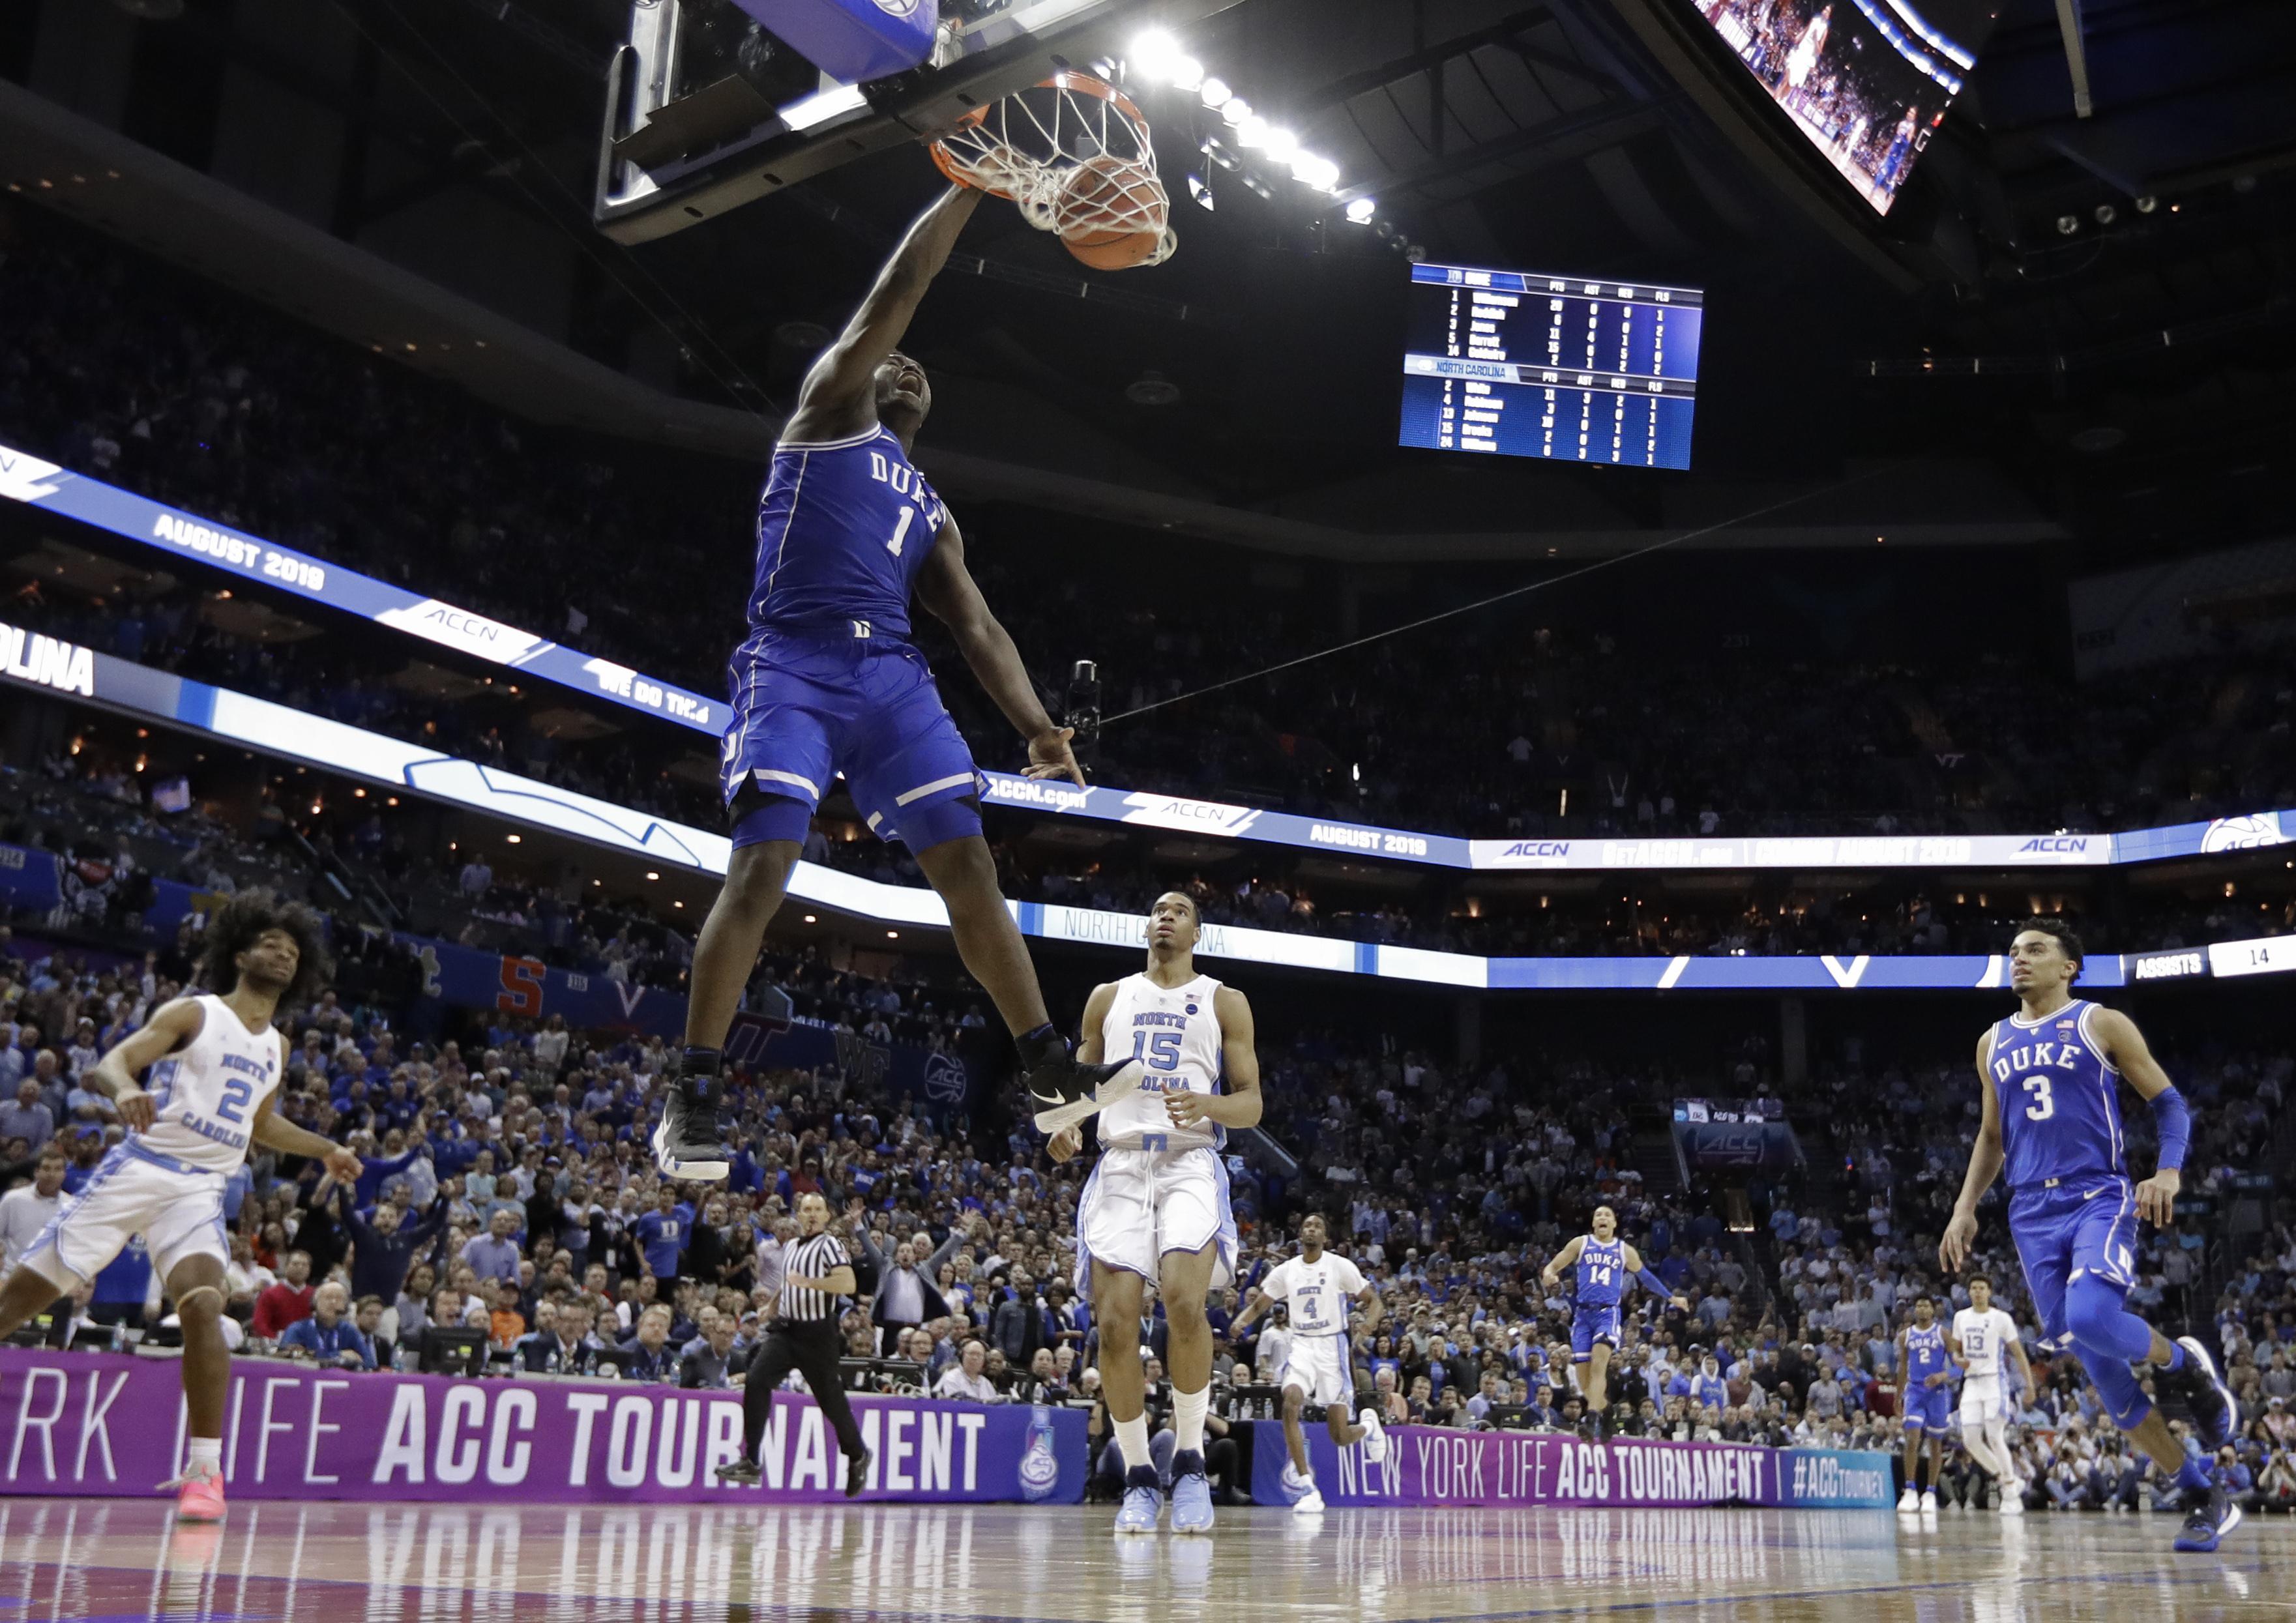 Top 25 roundup: No  5 Duke beats No  3 North Carolina in ACC